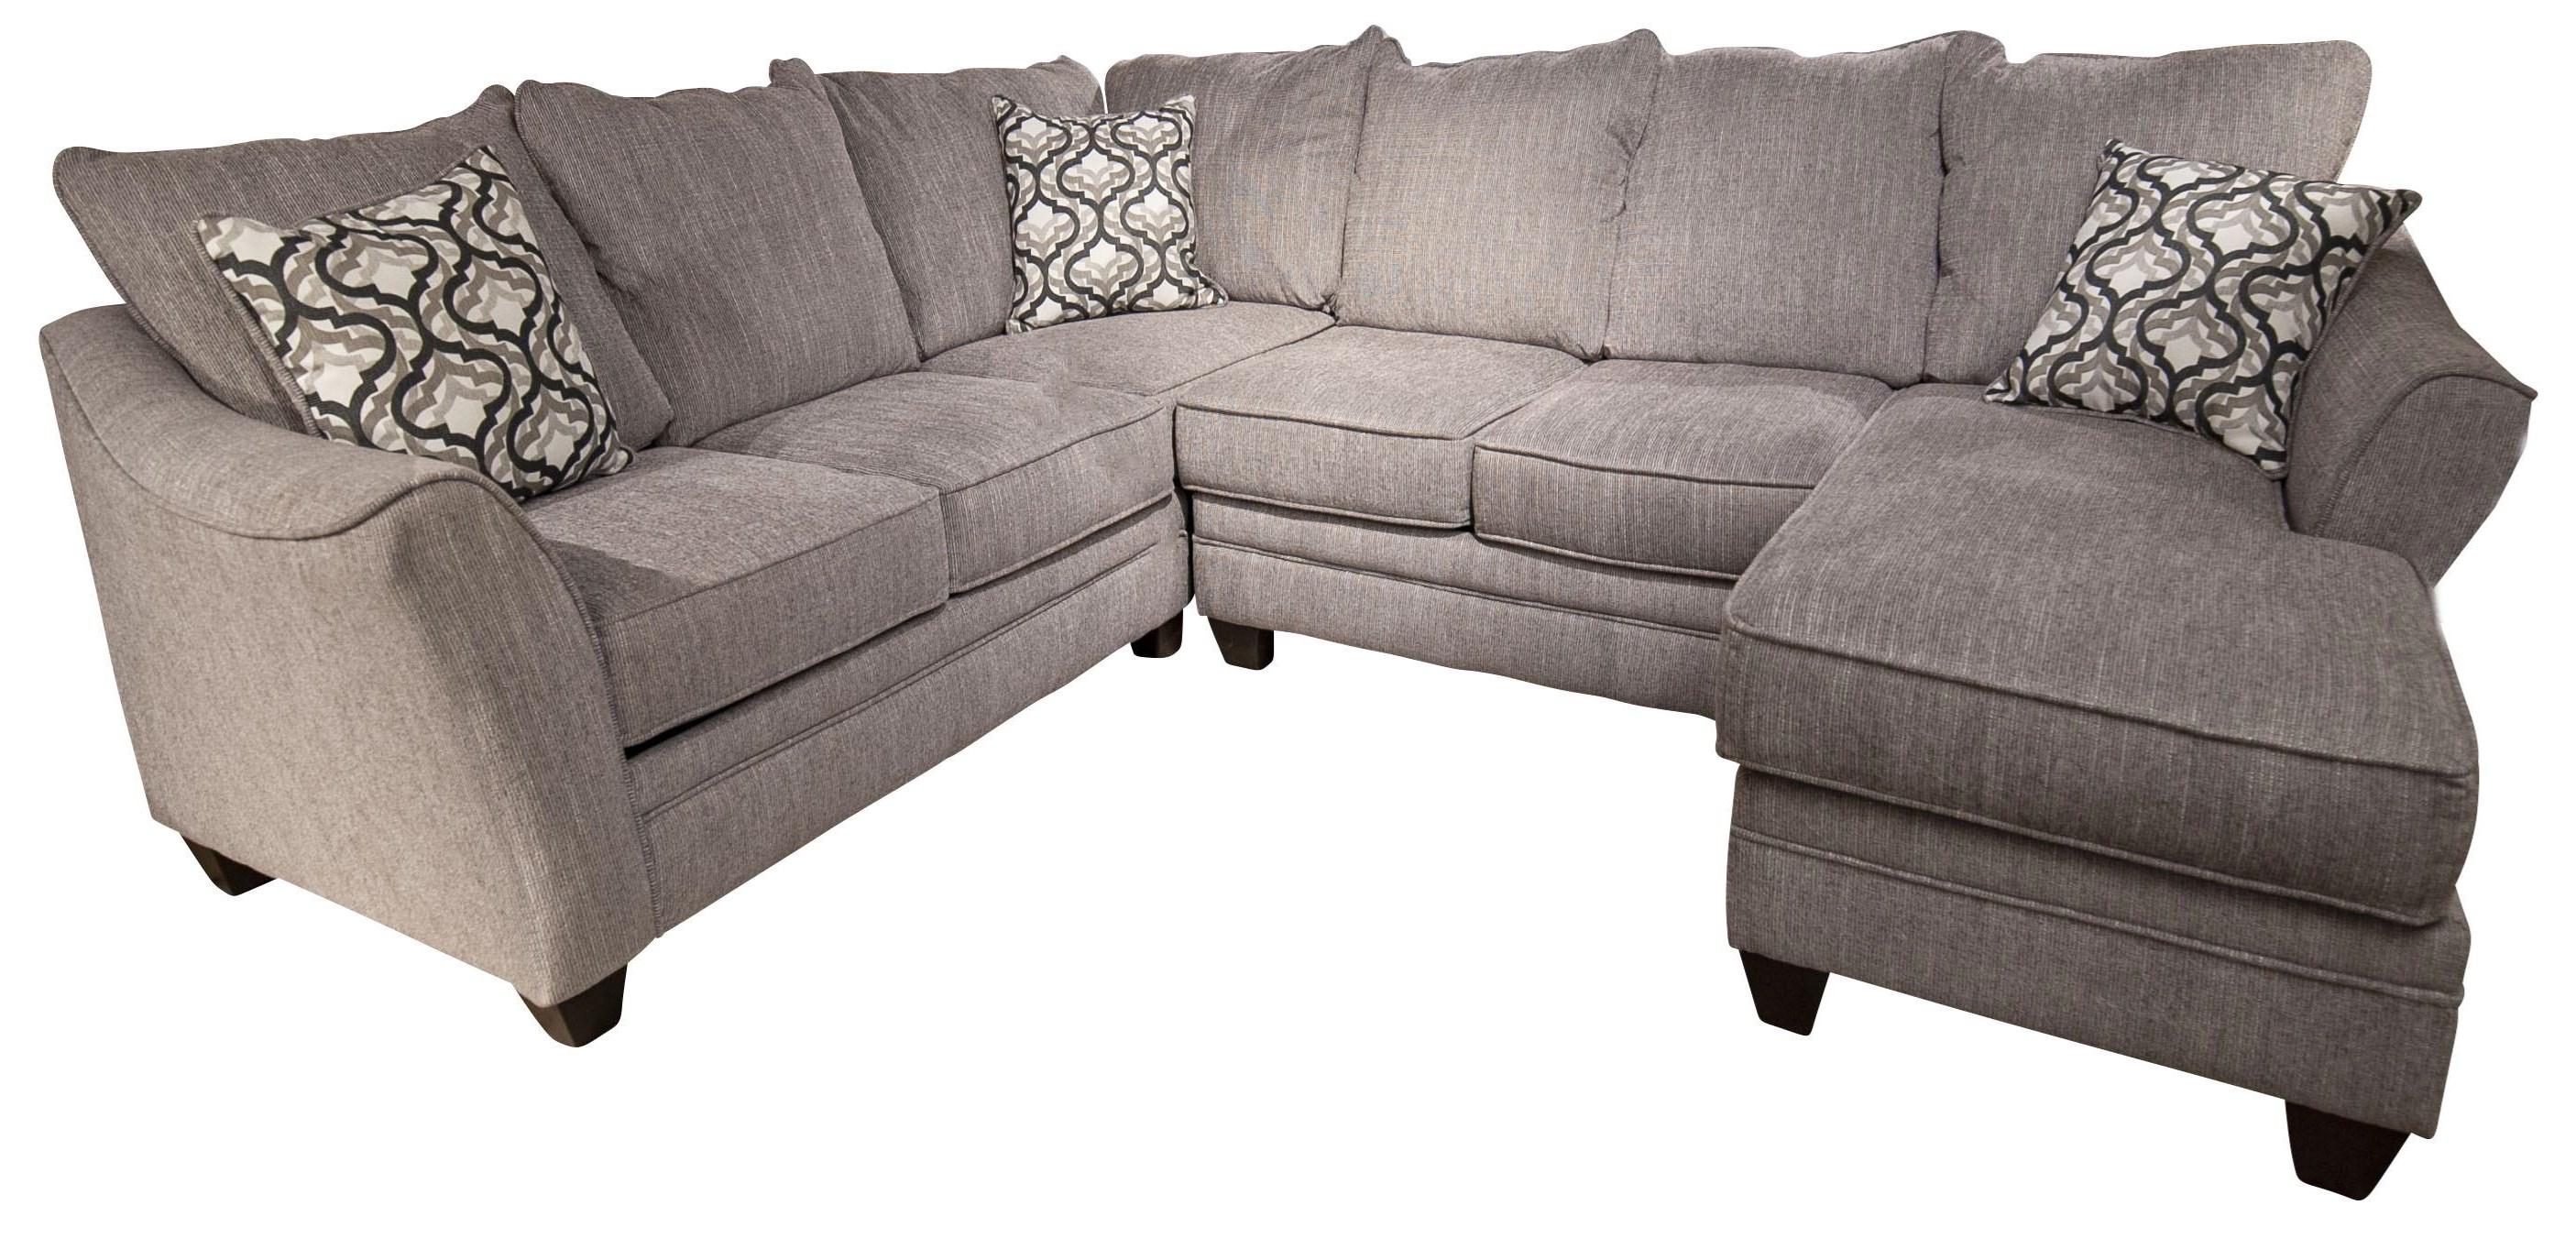 belford belford sectional sofa